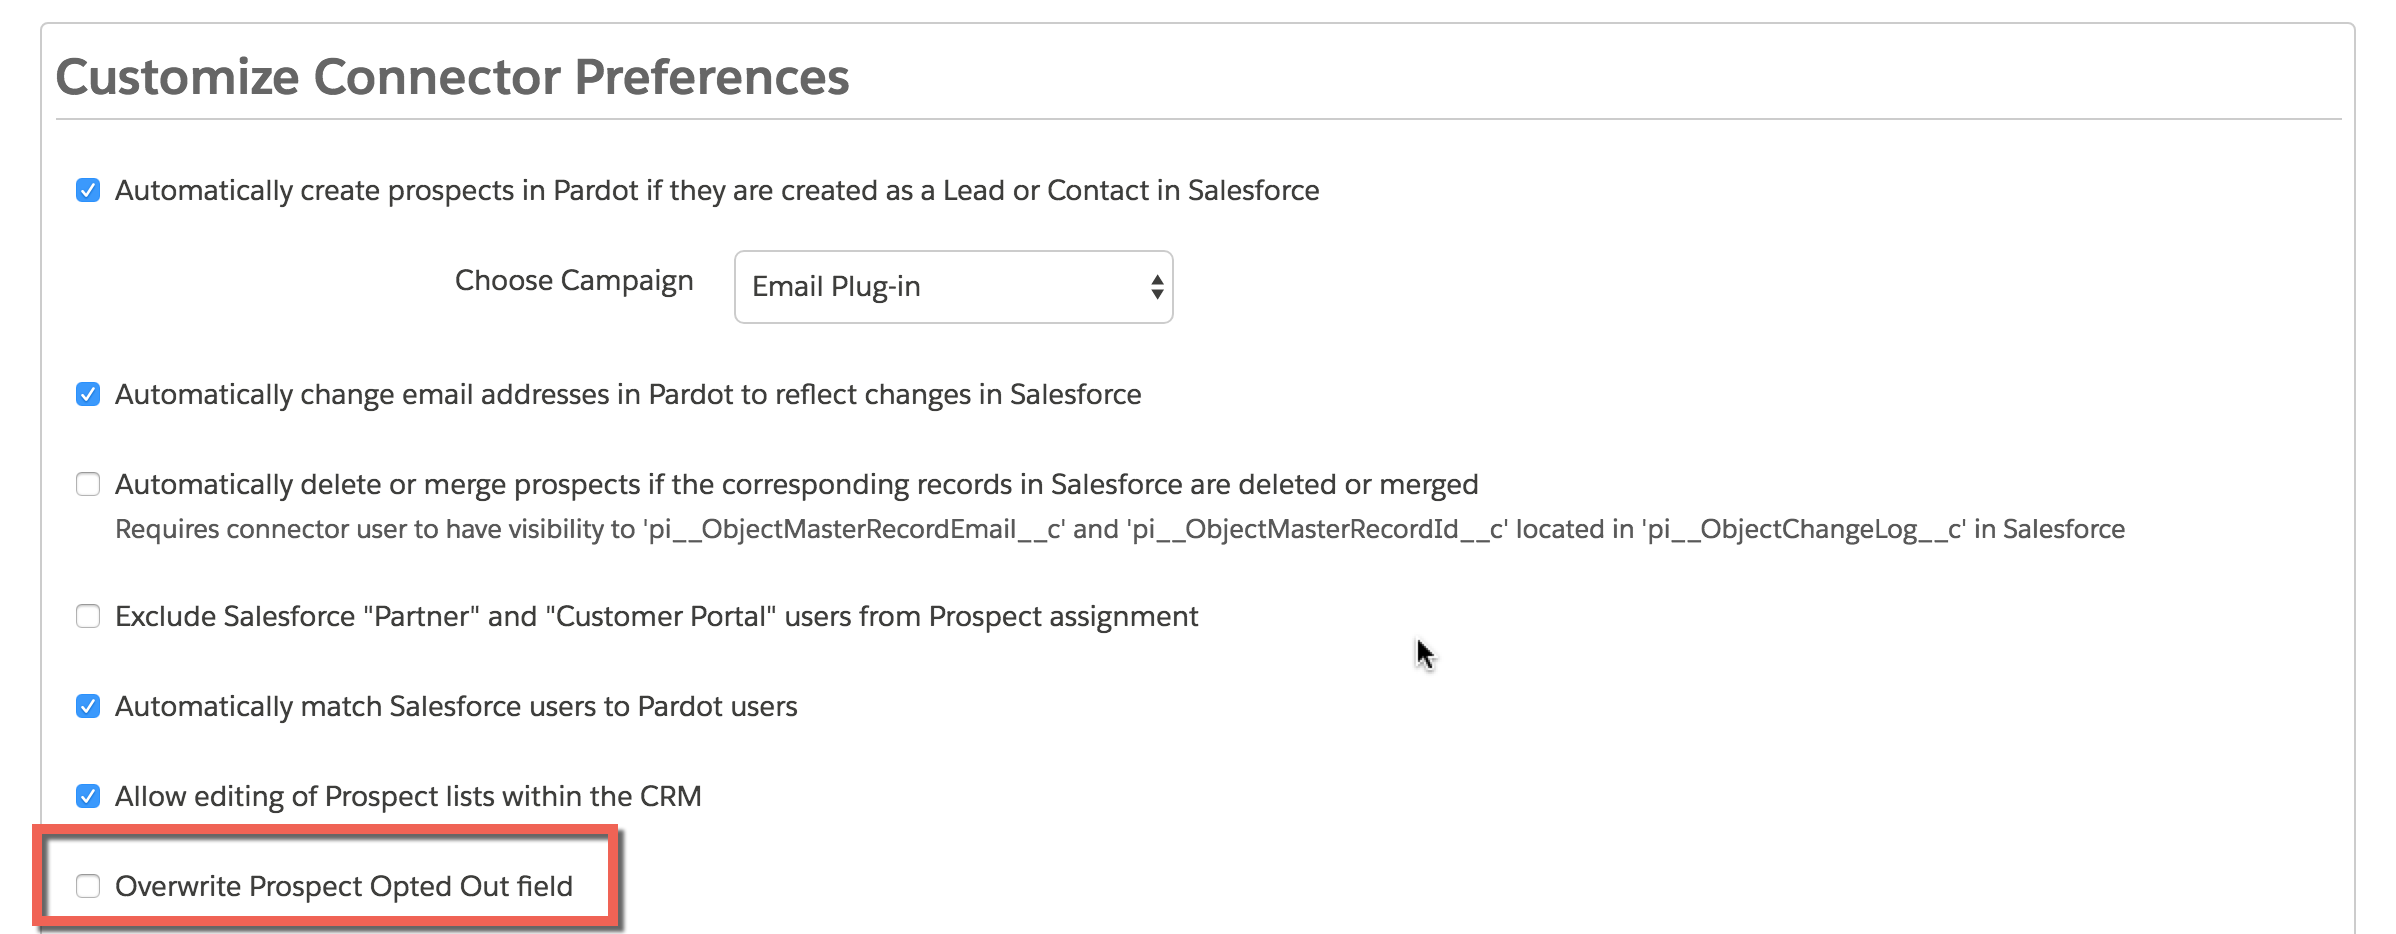 8 Salesforce Winter '19 Features Pardot Admins Will Love